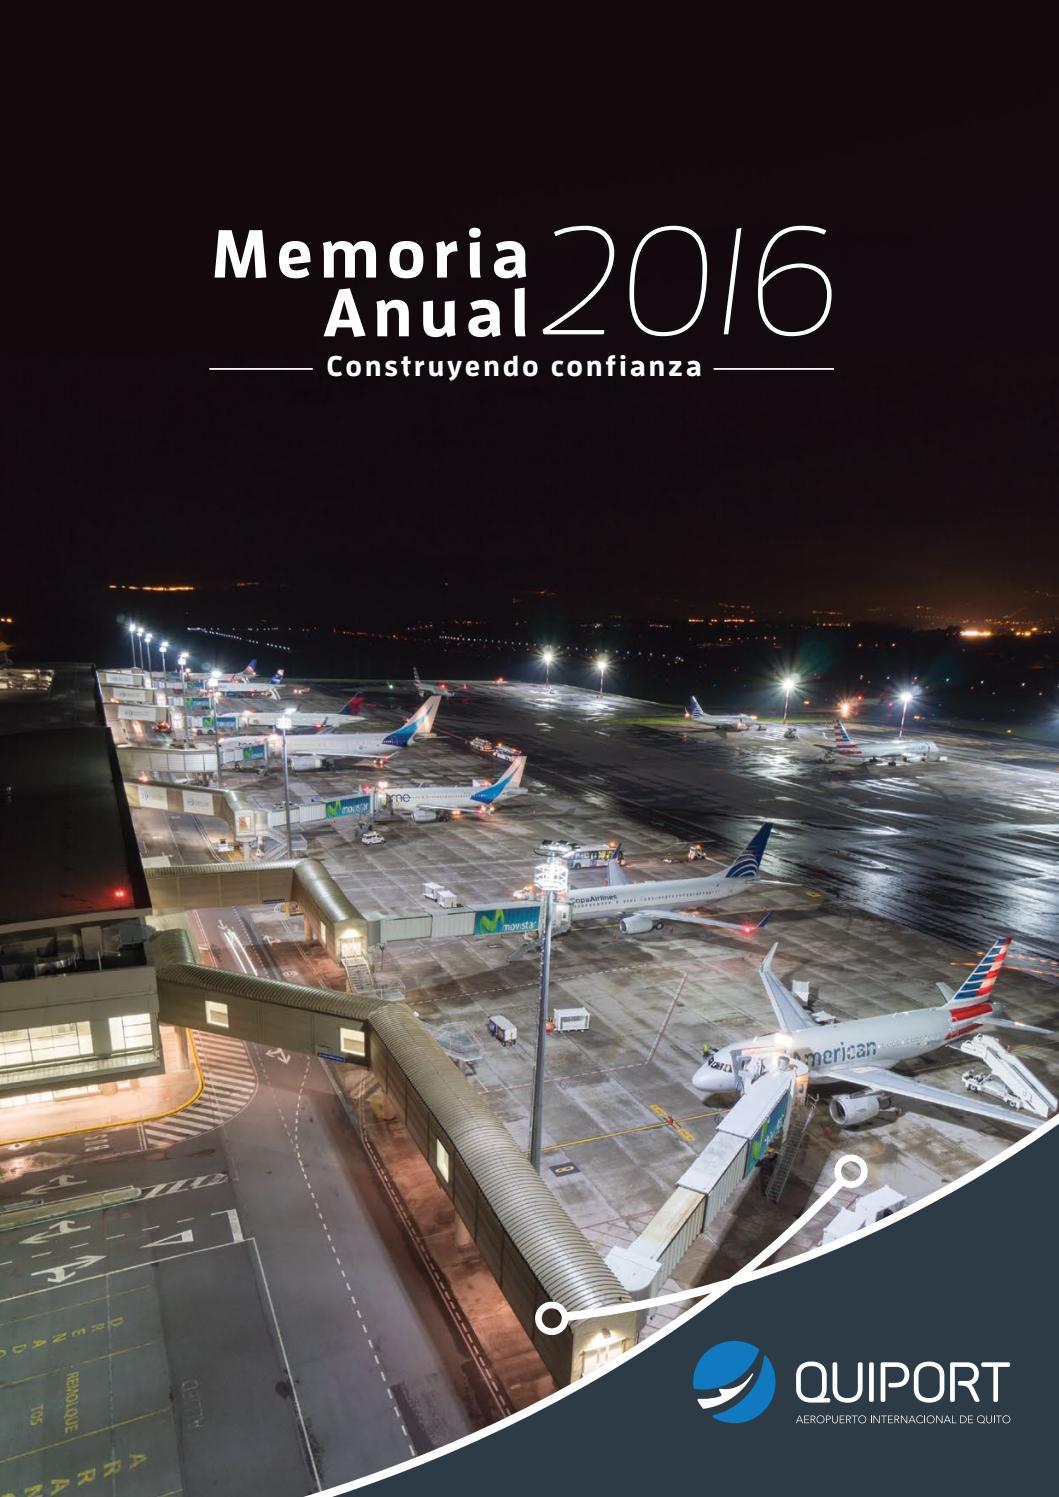 Memoria anual 2016 Quiport by Corporación Quiport S.A. - issuu